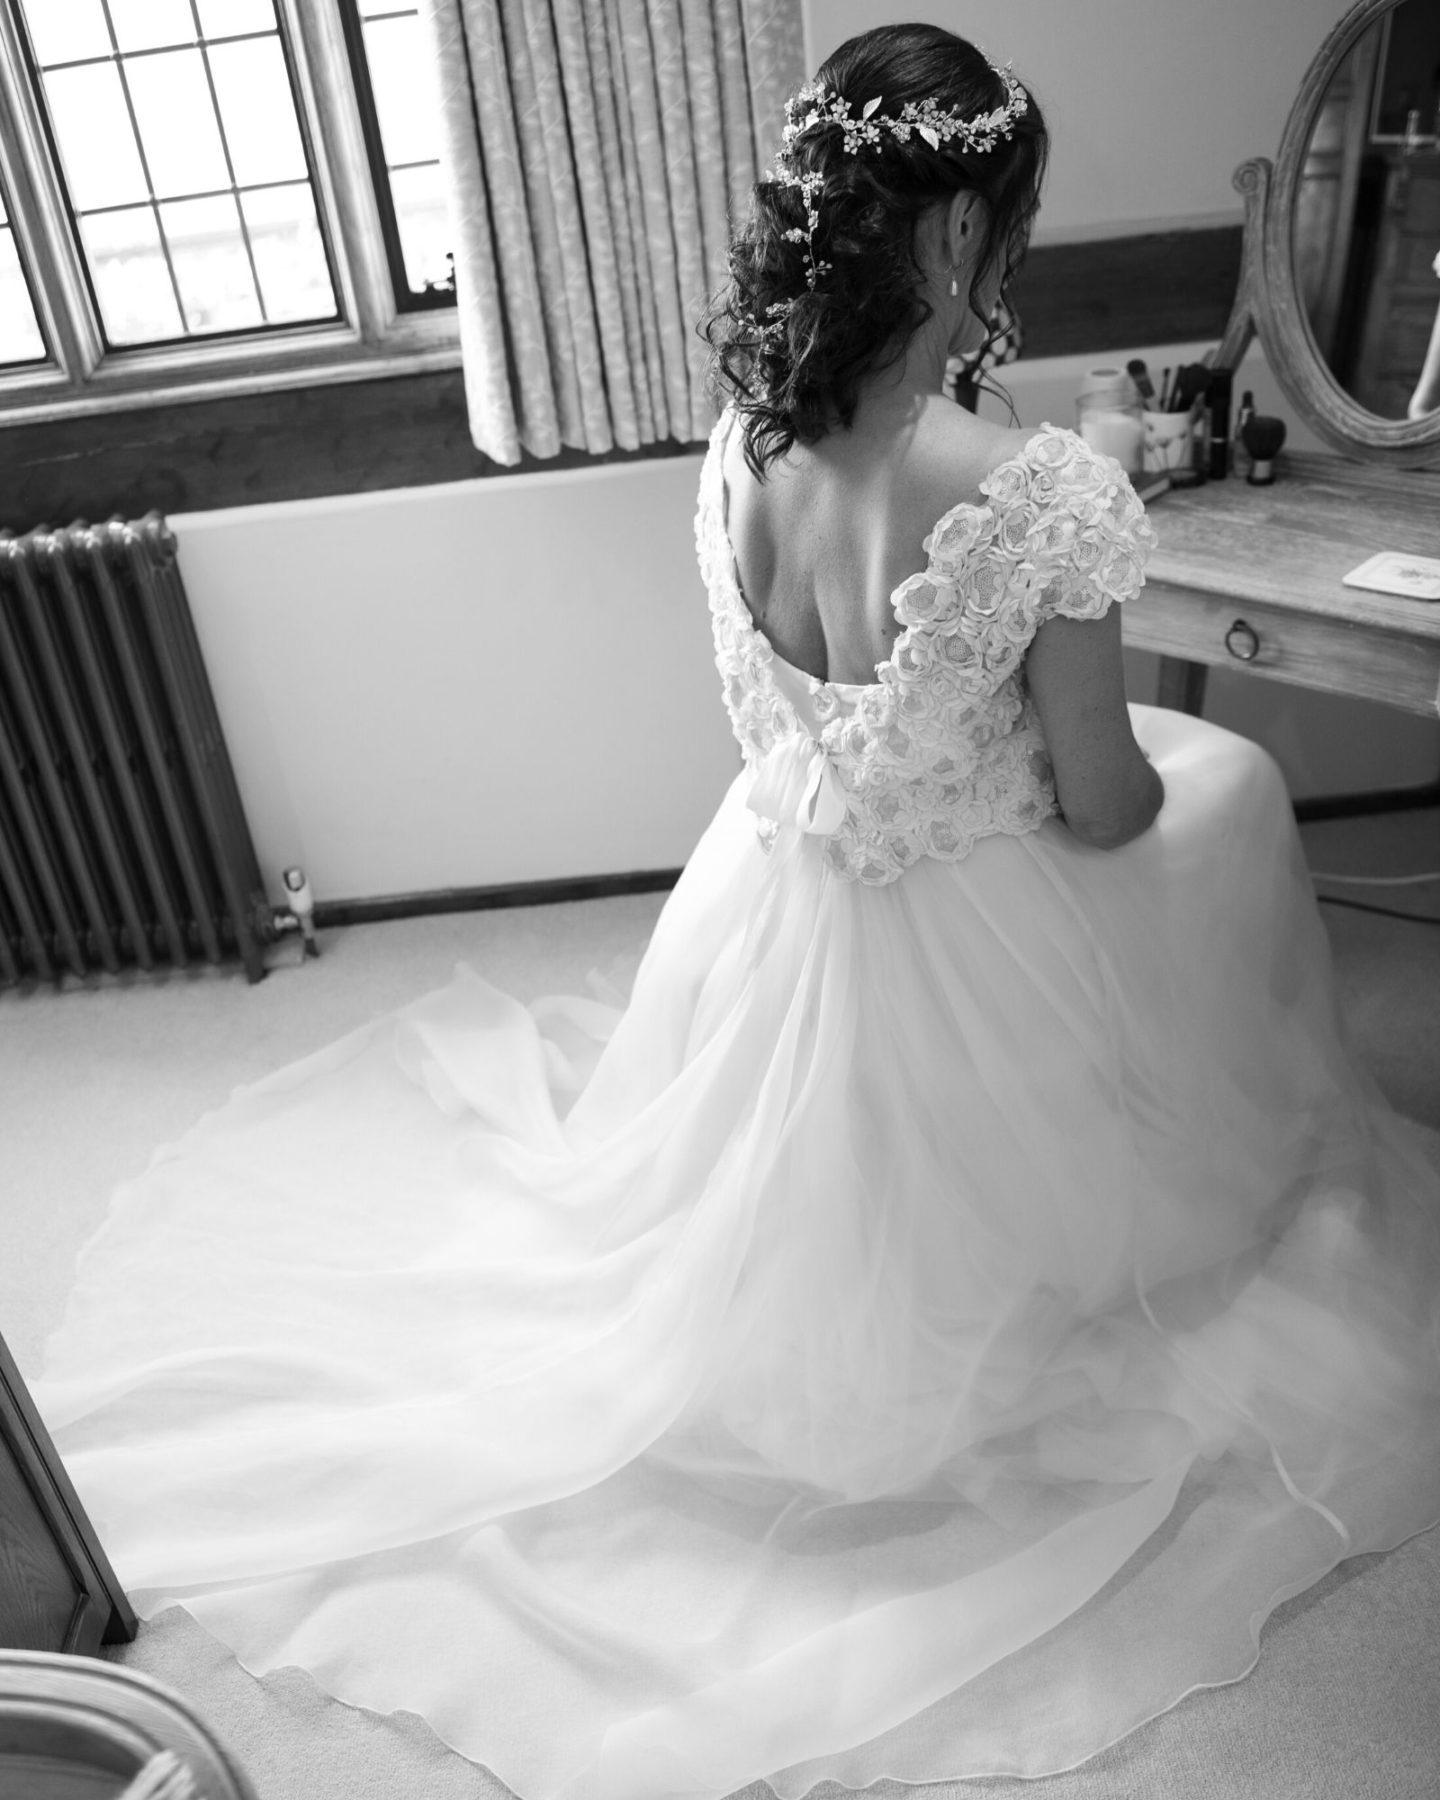 bride wearing bespoke lace wedding dress from boho bride bridal boutique in Stratford Upon Avon